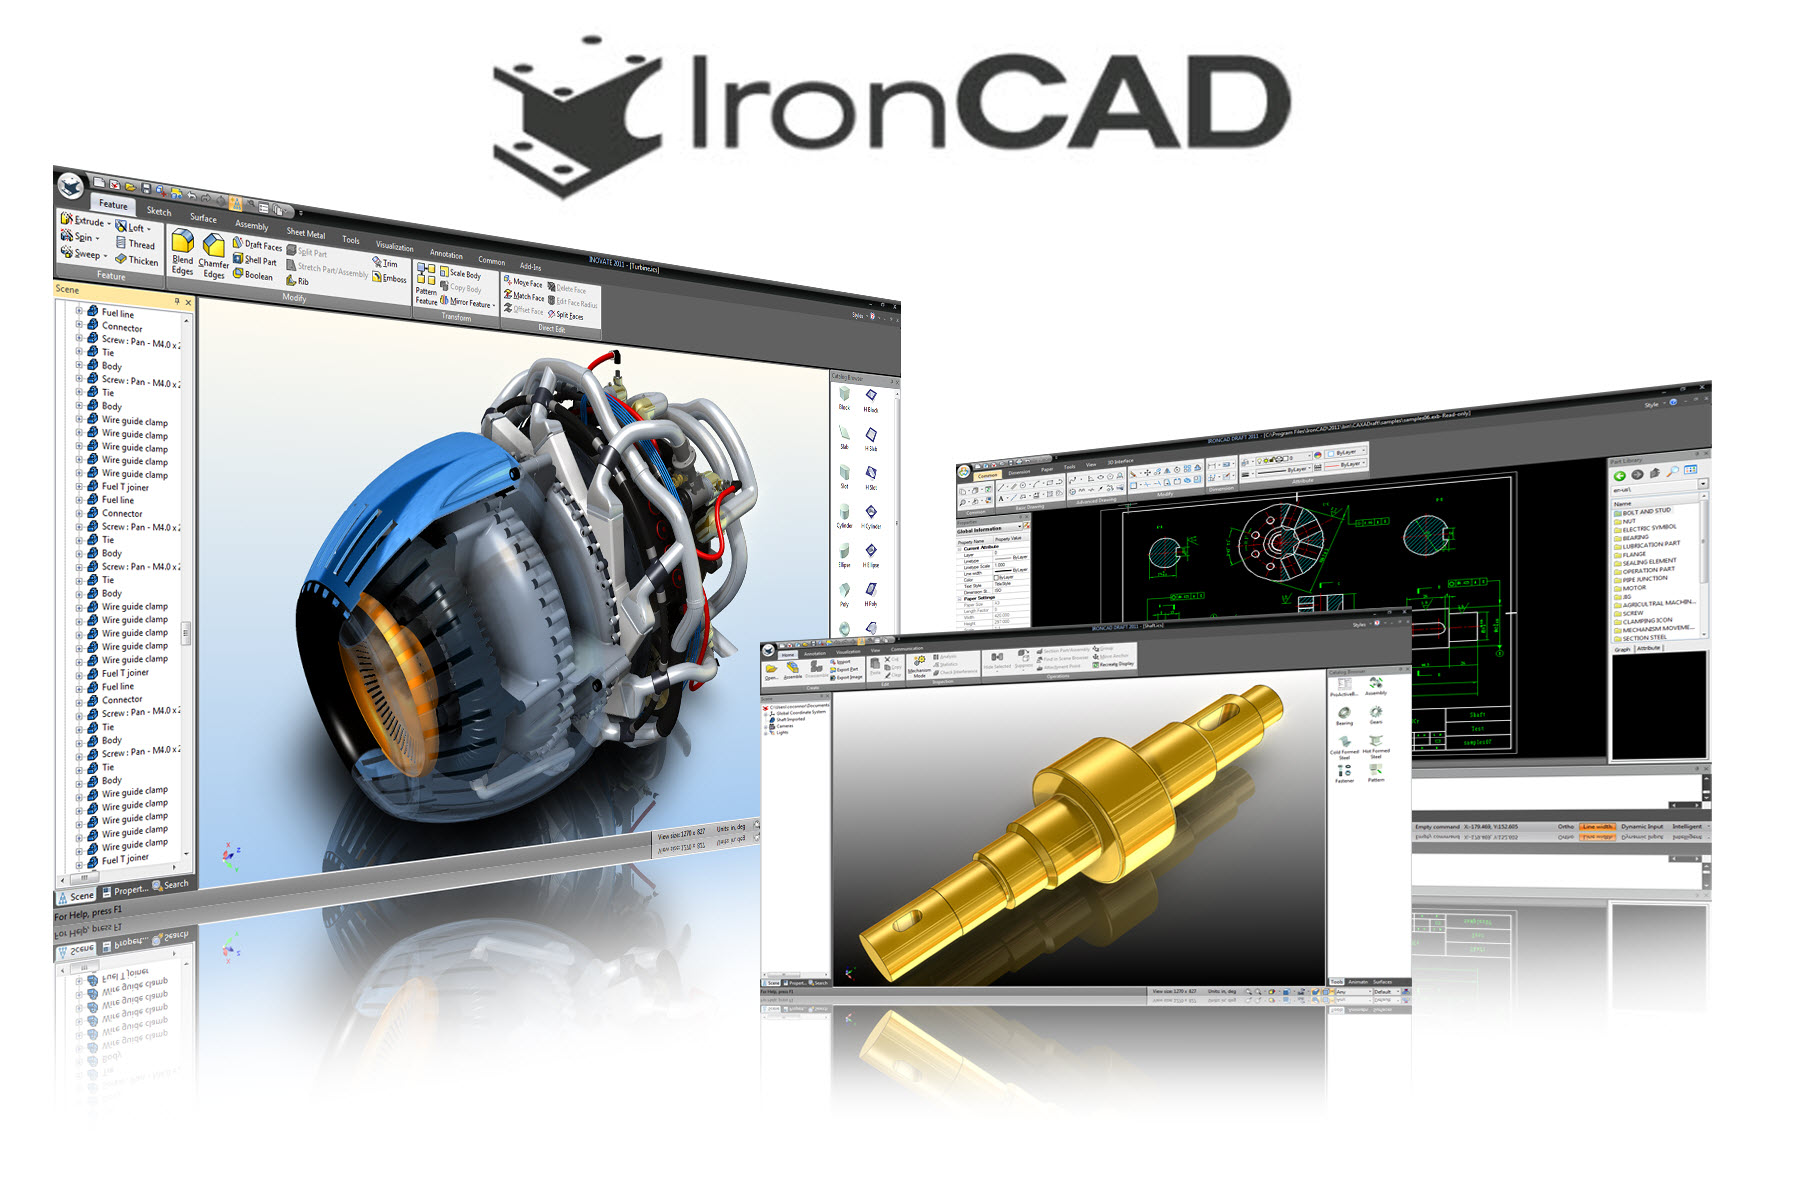 IronCAD_Screen_Image.jpg